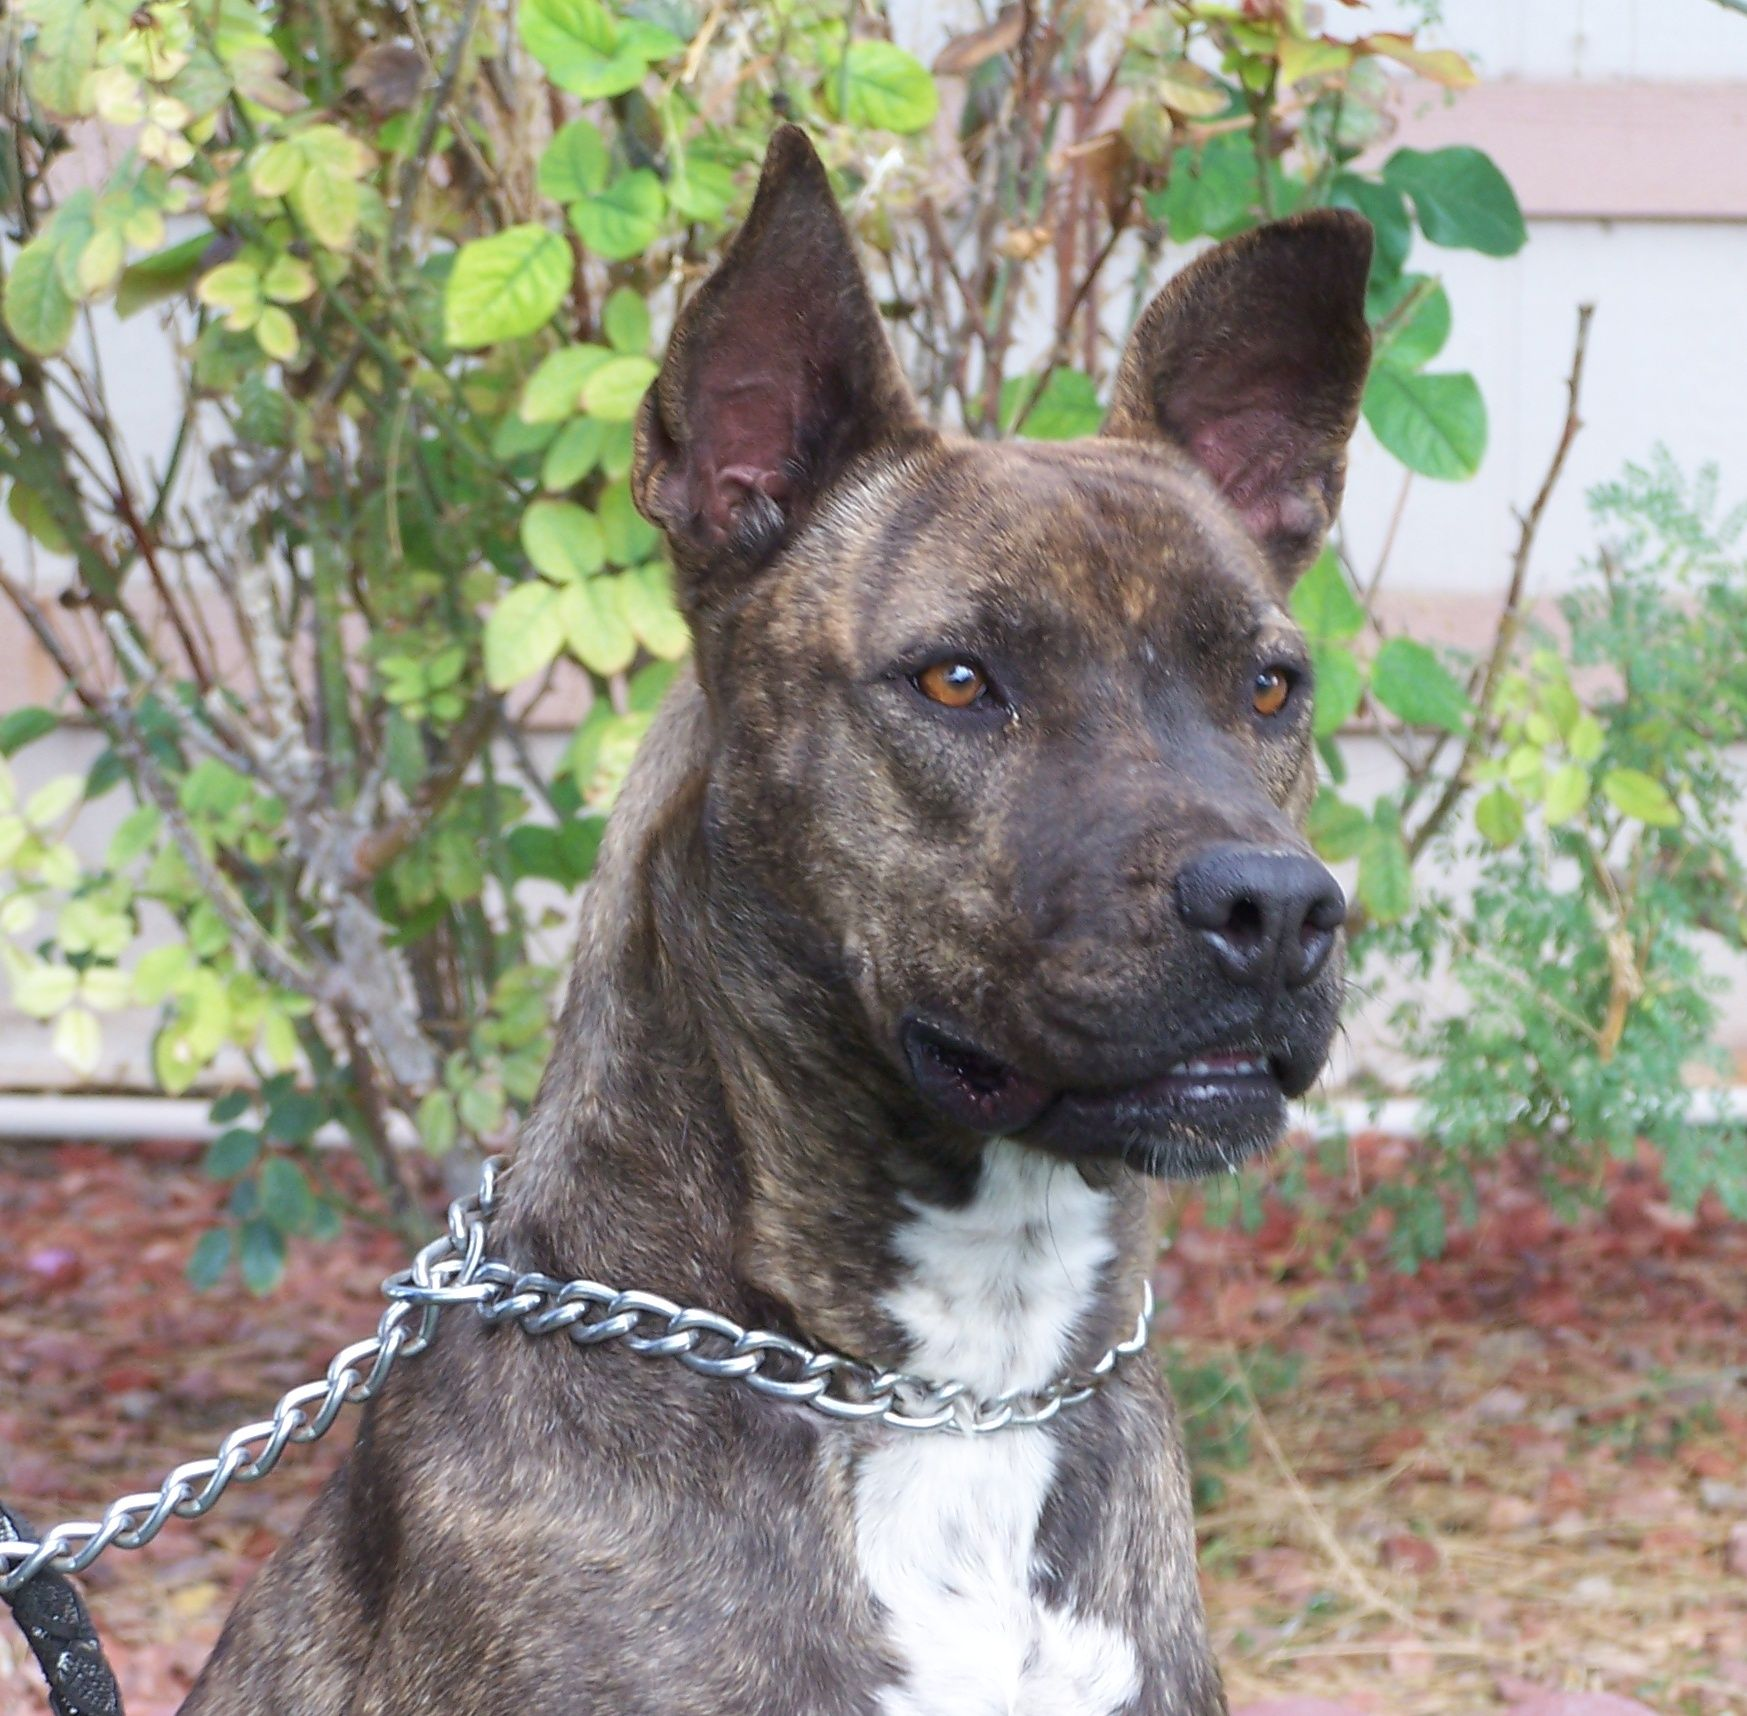 Pitbull Chihuahua Mix Full Grown | animals | dogs 1 ...  Pitbull Chihuah...